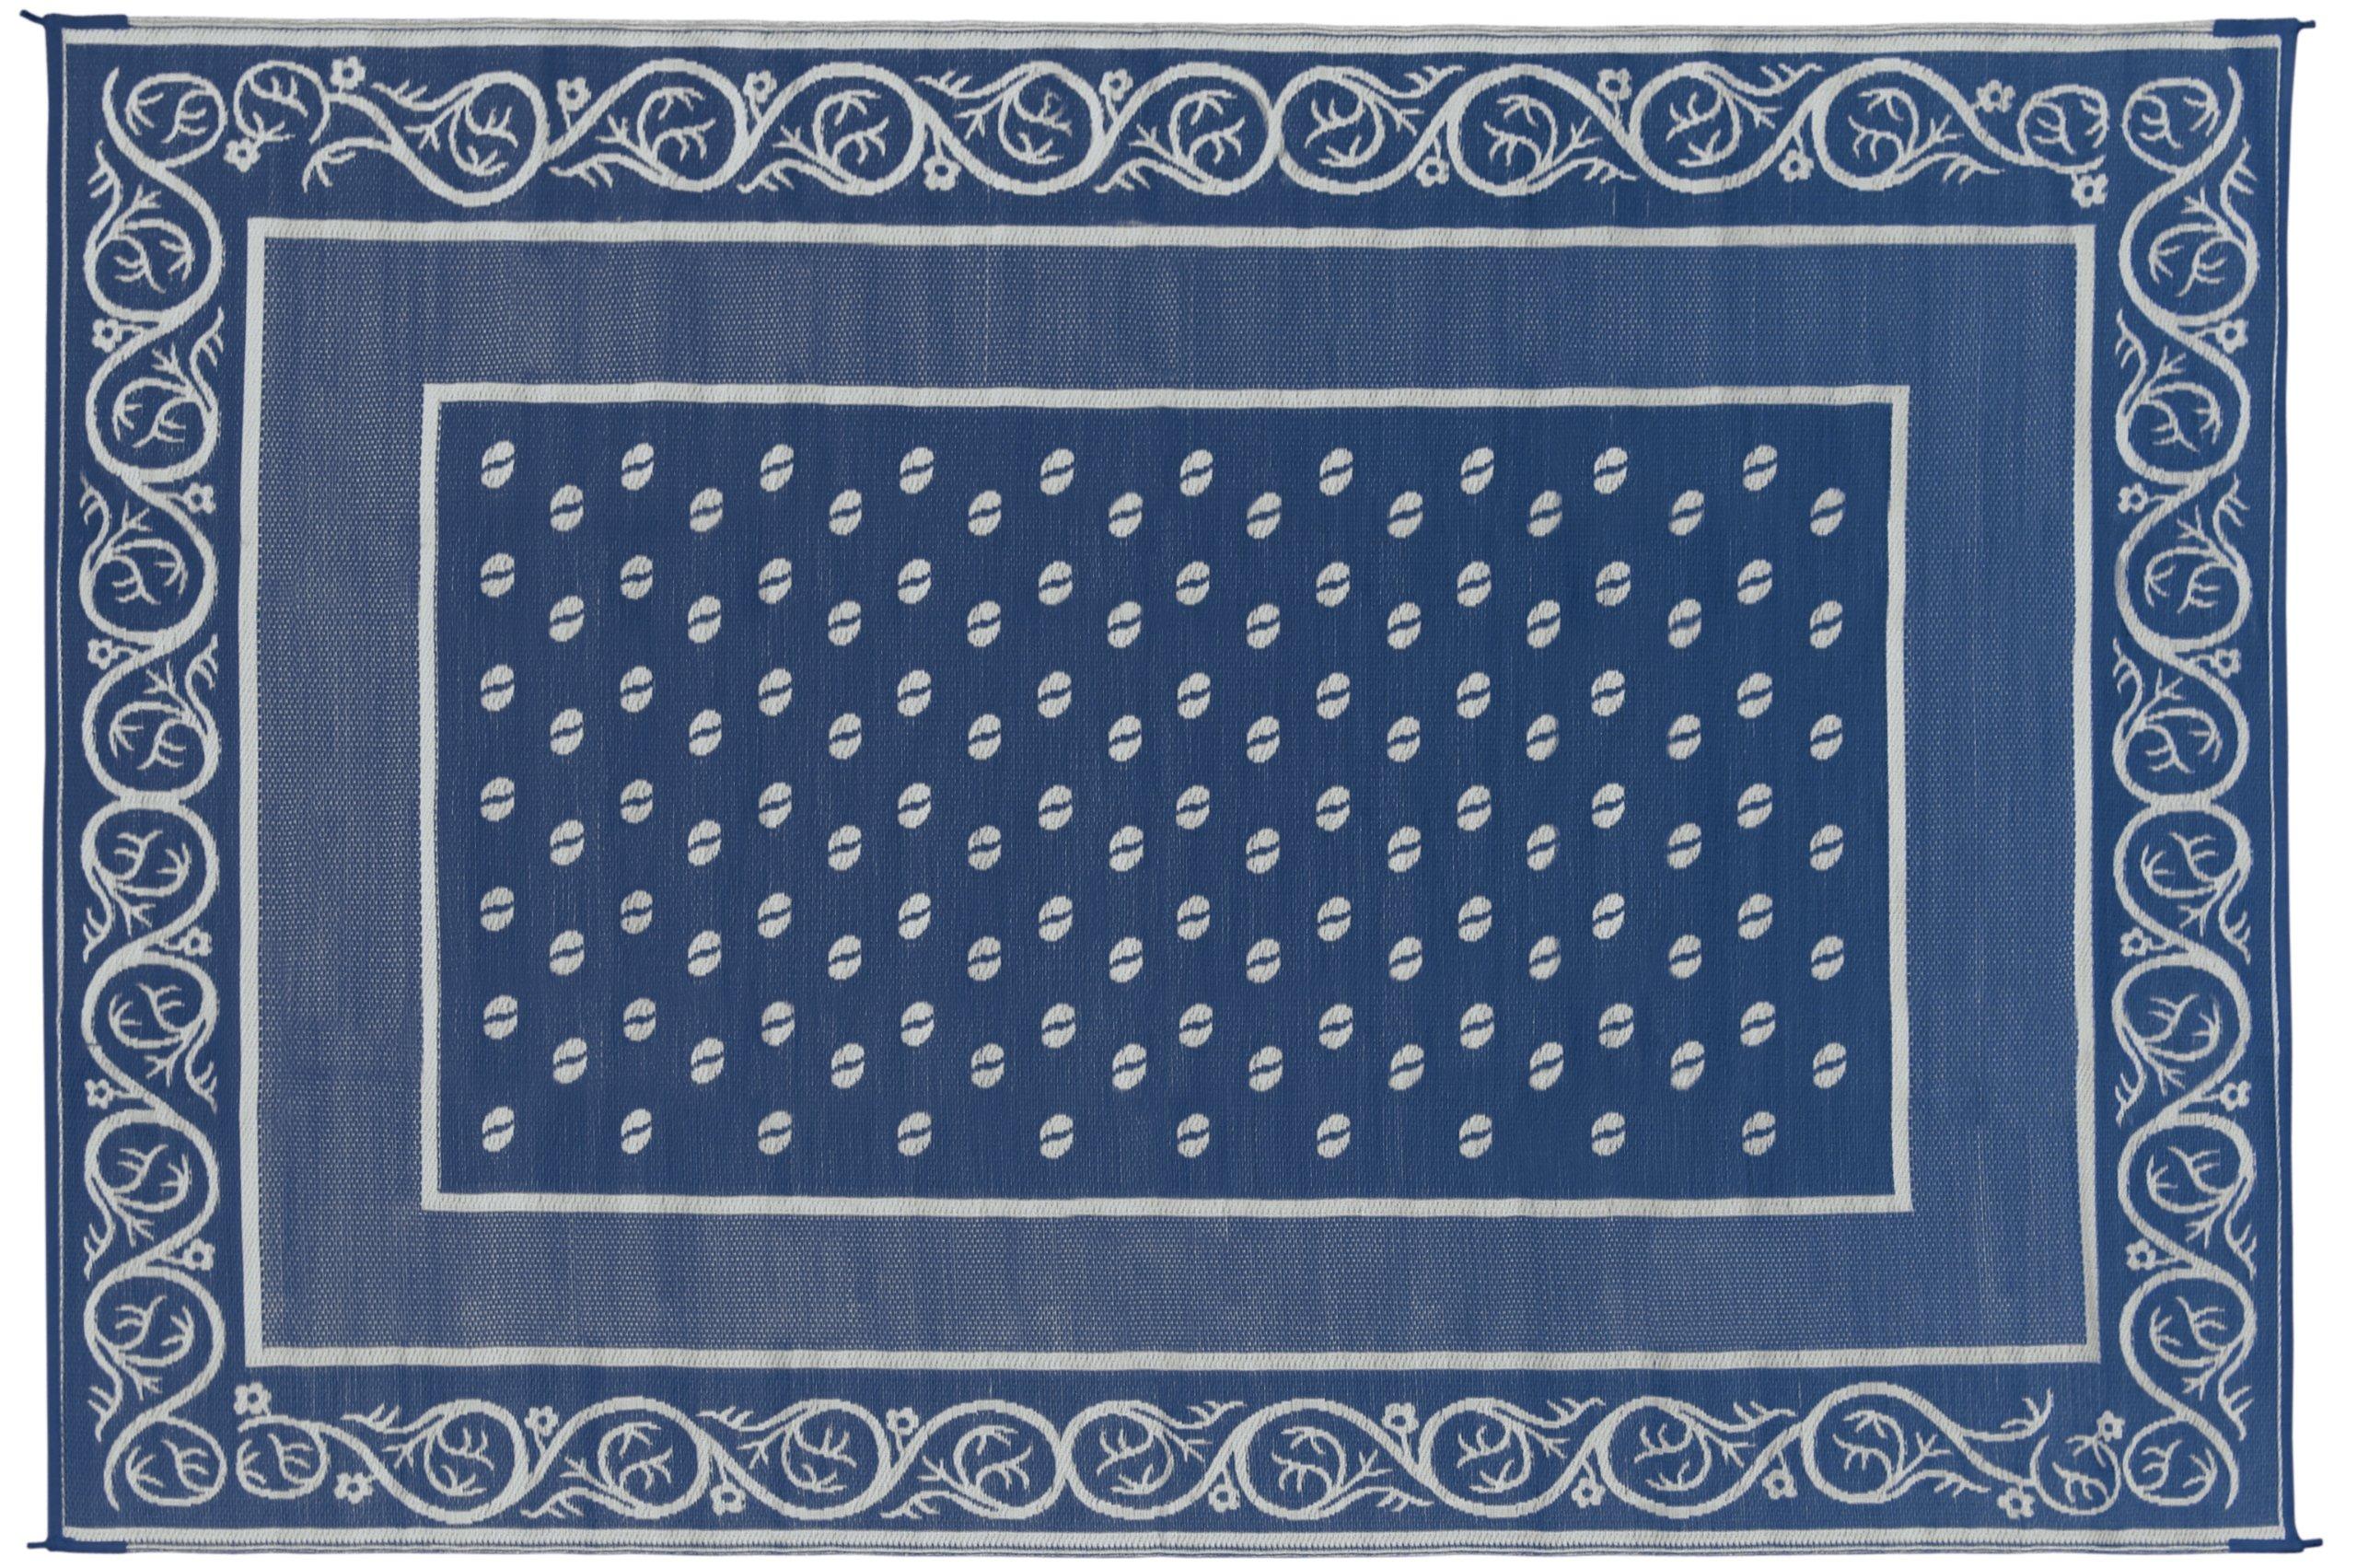 Faulkner 48701 Vineyard 9 by 12-Feet Blue Multi-Purpose Mat